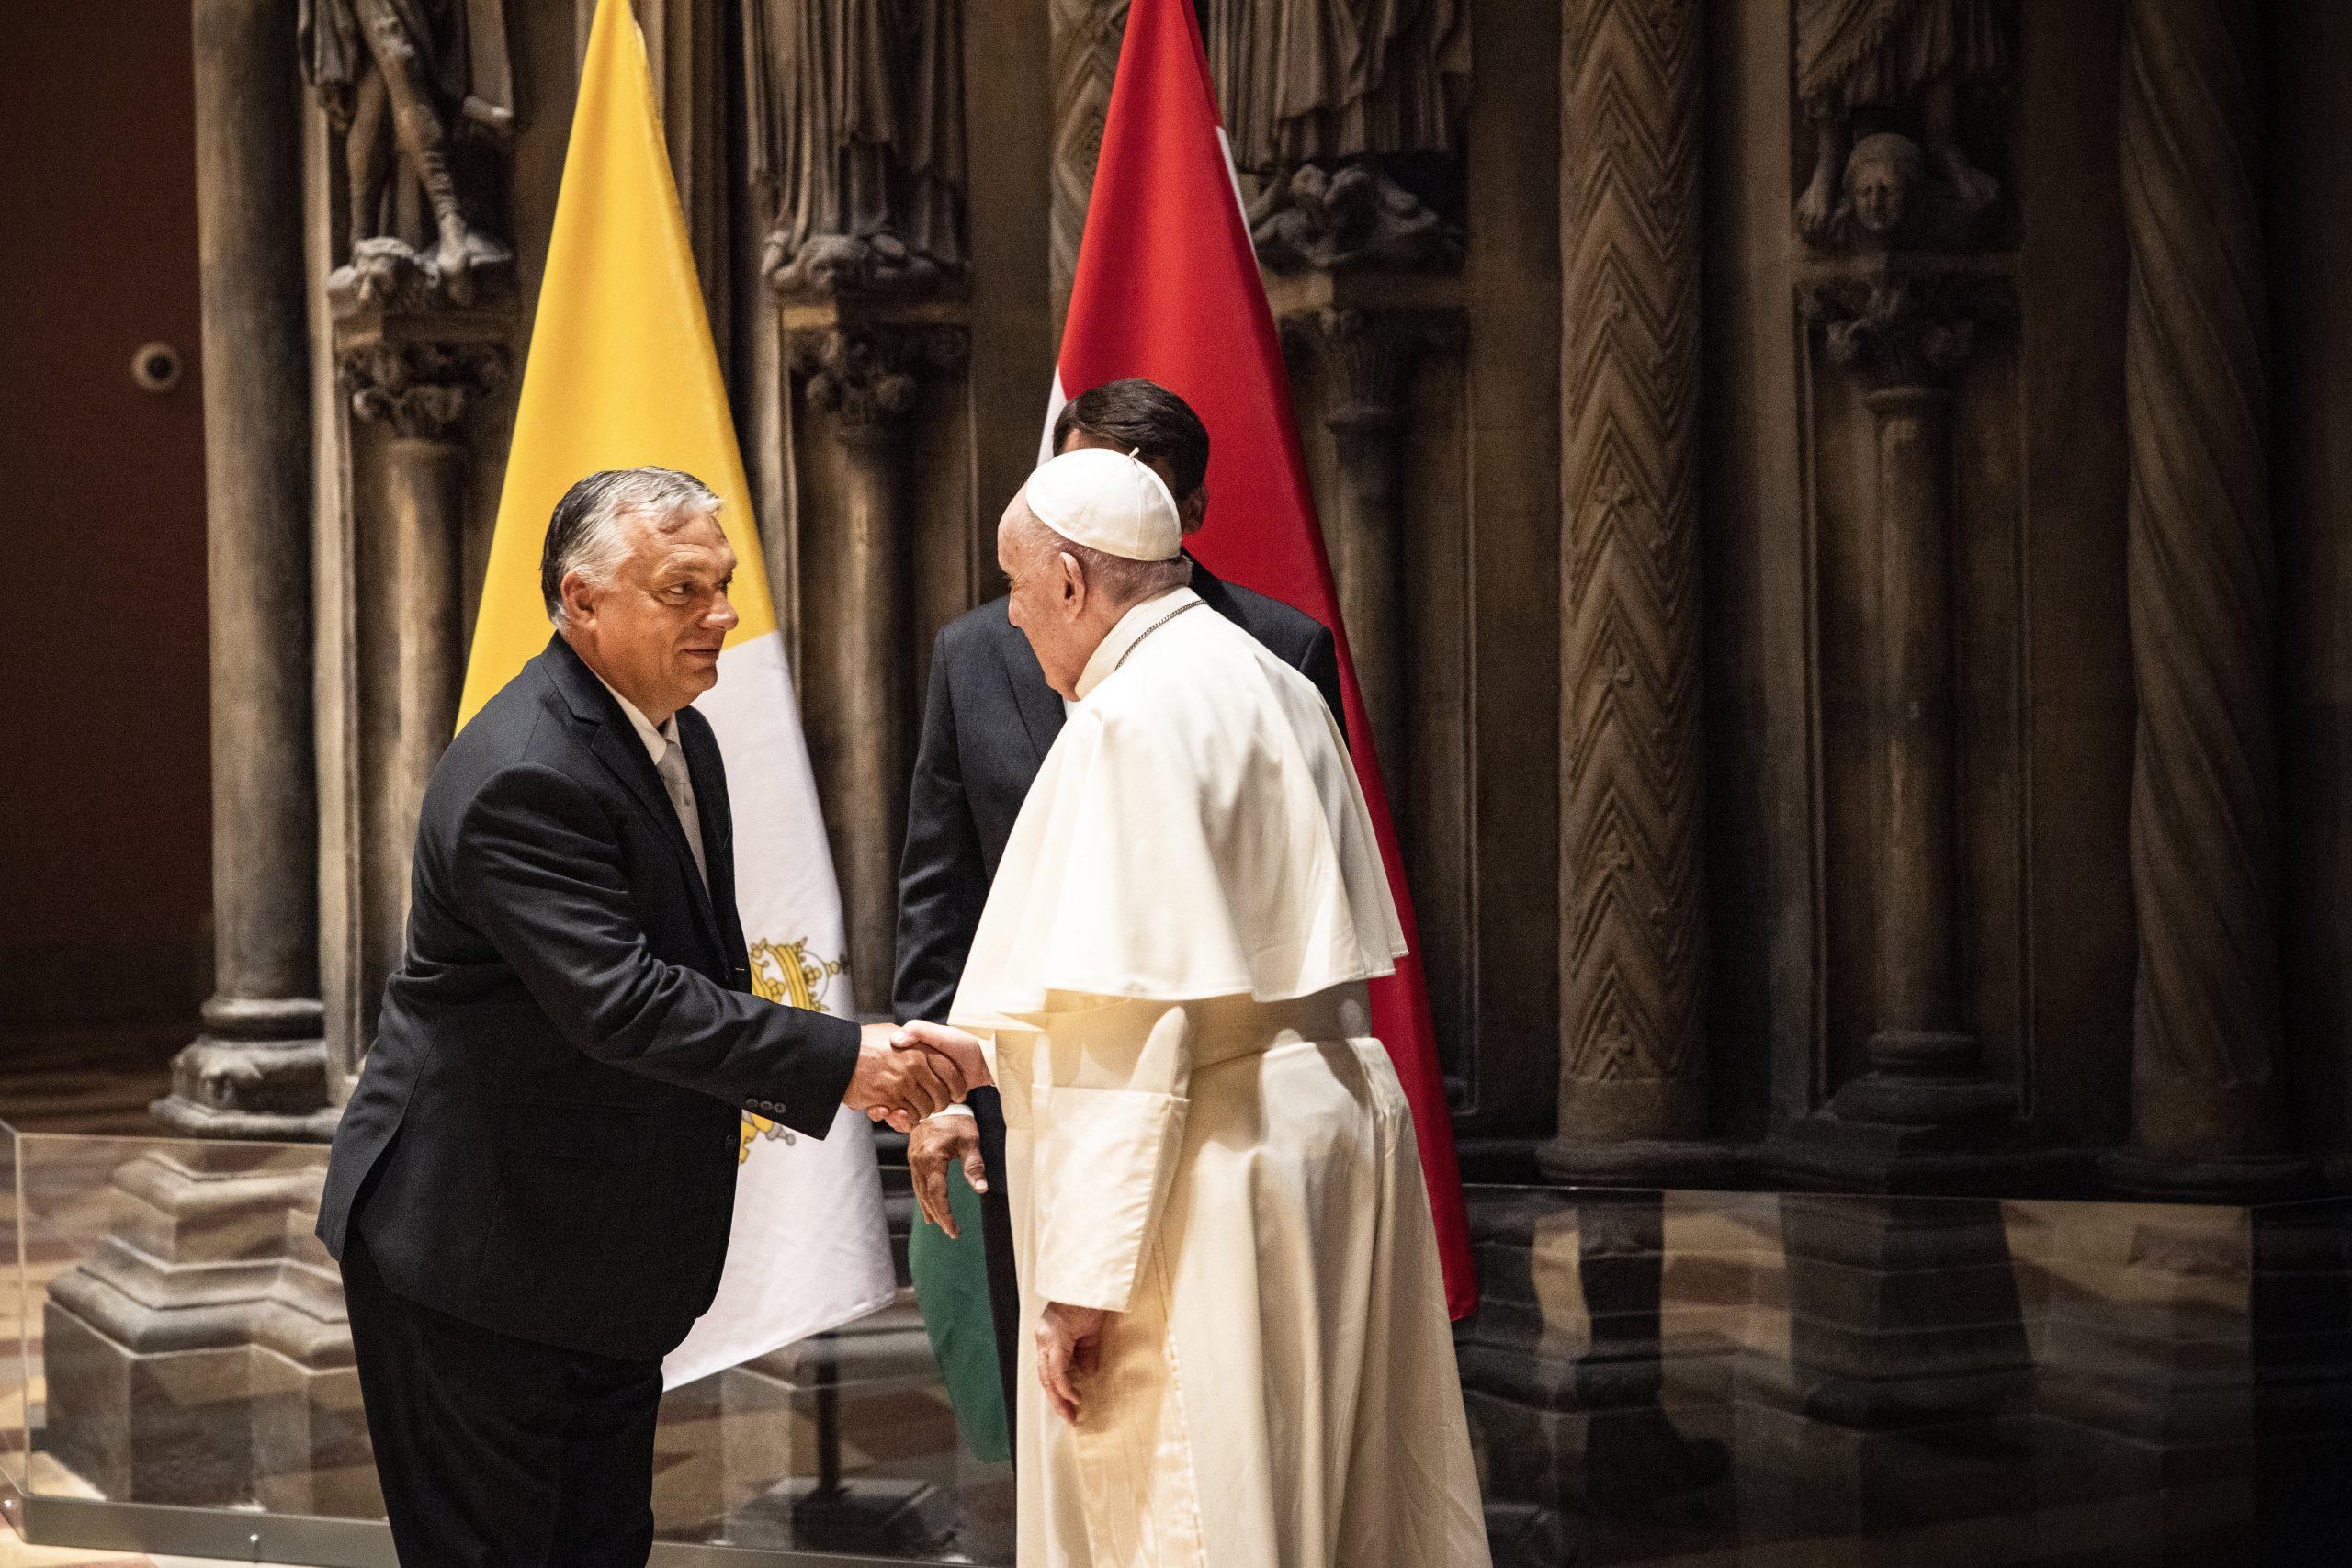 President Áder and PM Orbán Meet Pope Francis